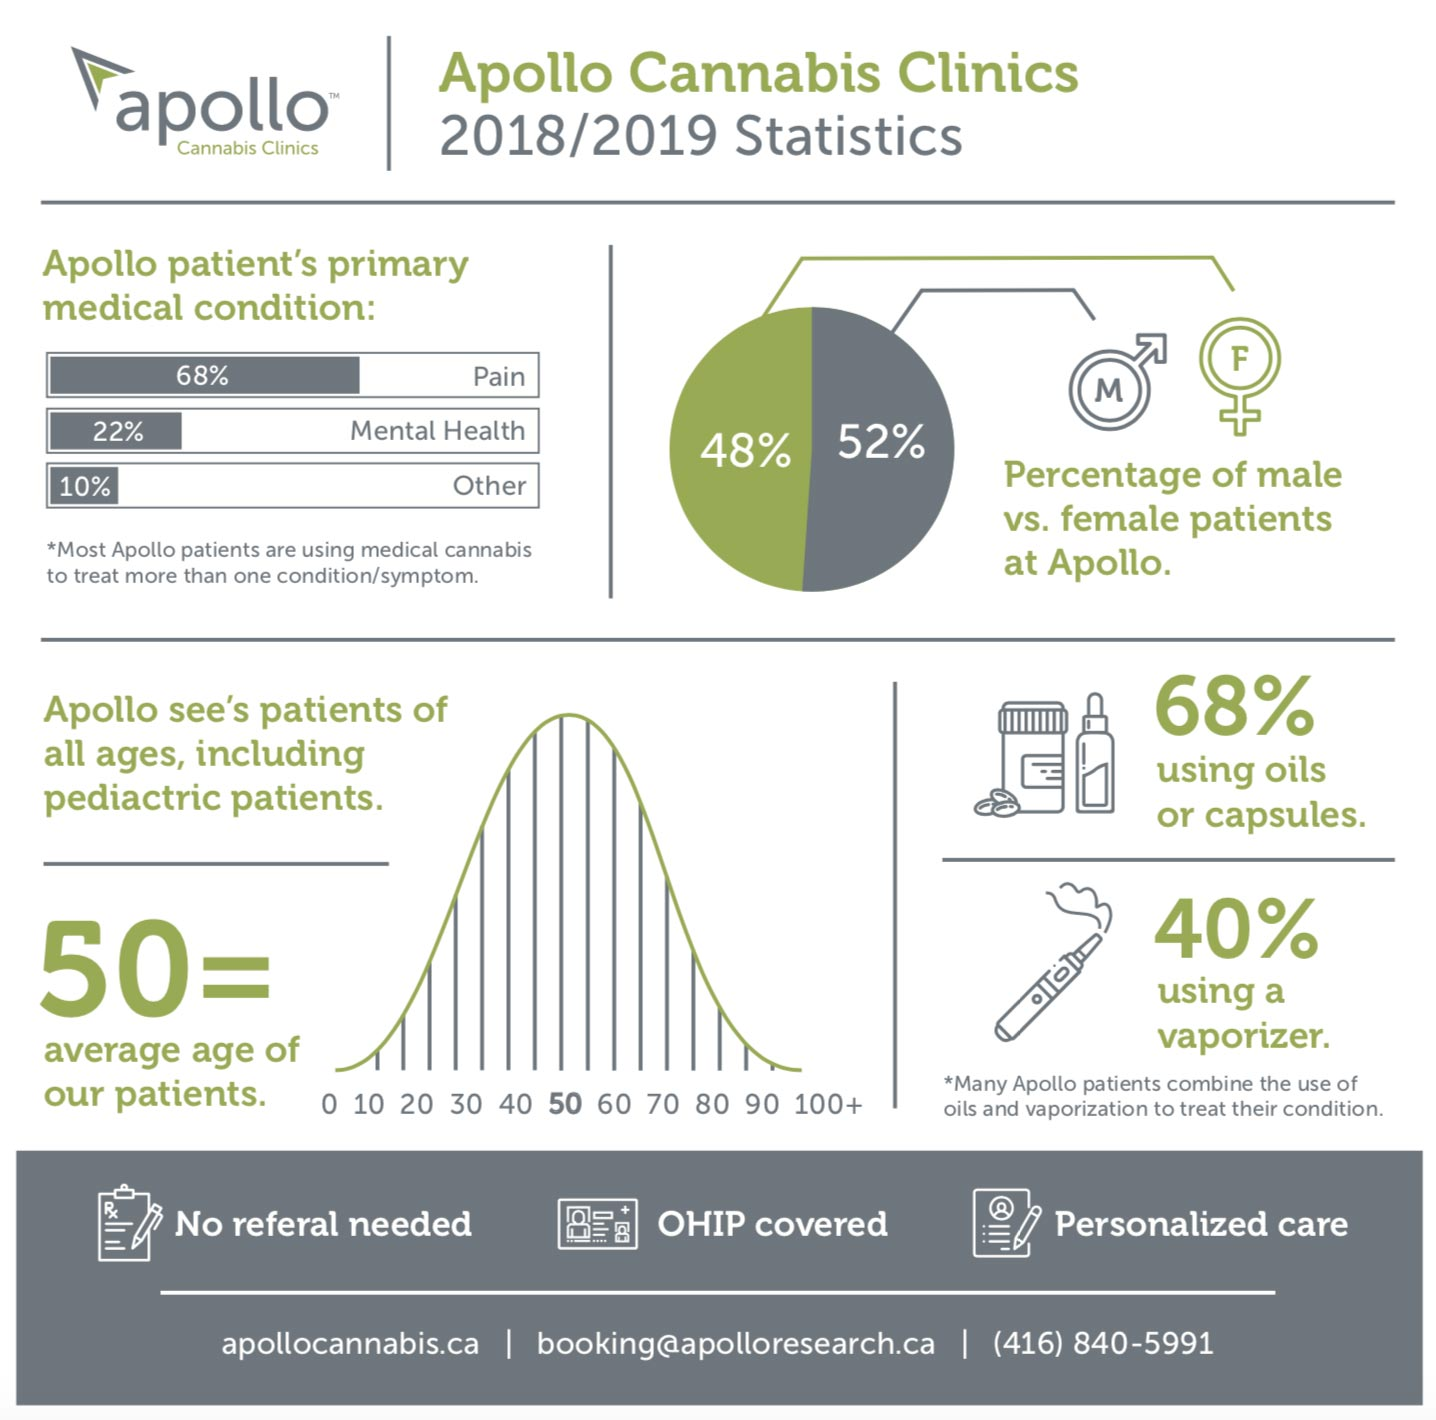 Apollo Cannabis Clinics Statistics 2018/19